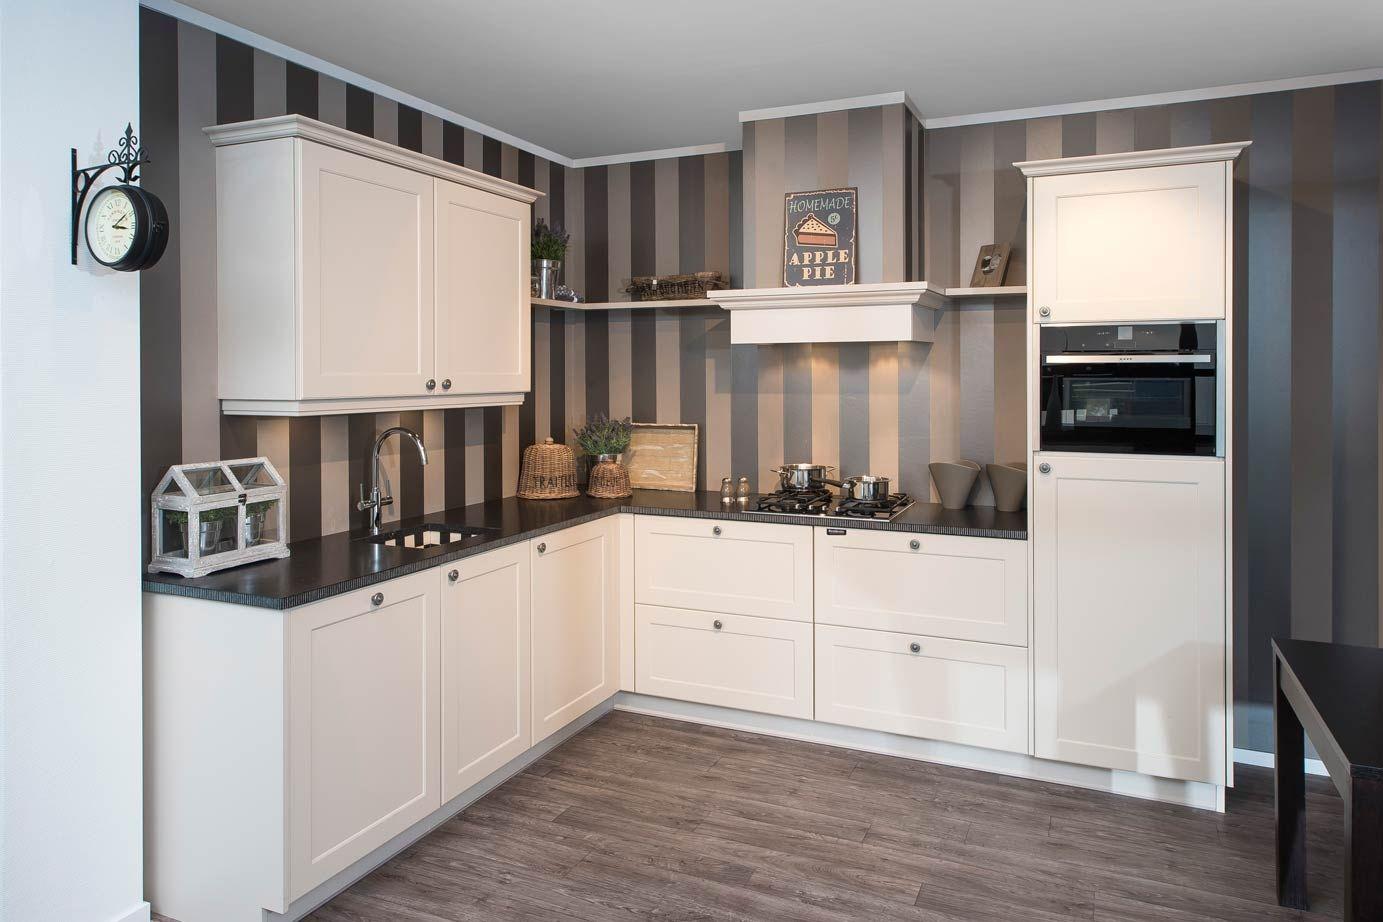 Inspirerend ipad houder keuken decorati decor